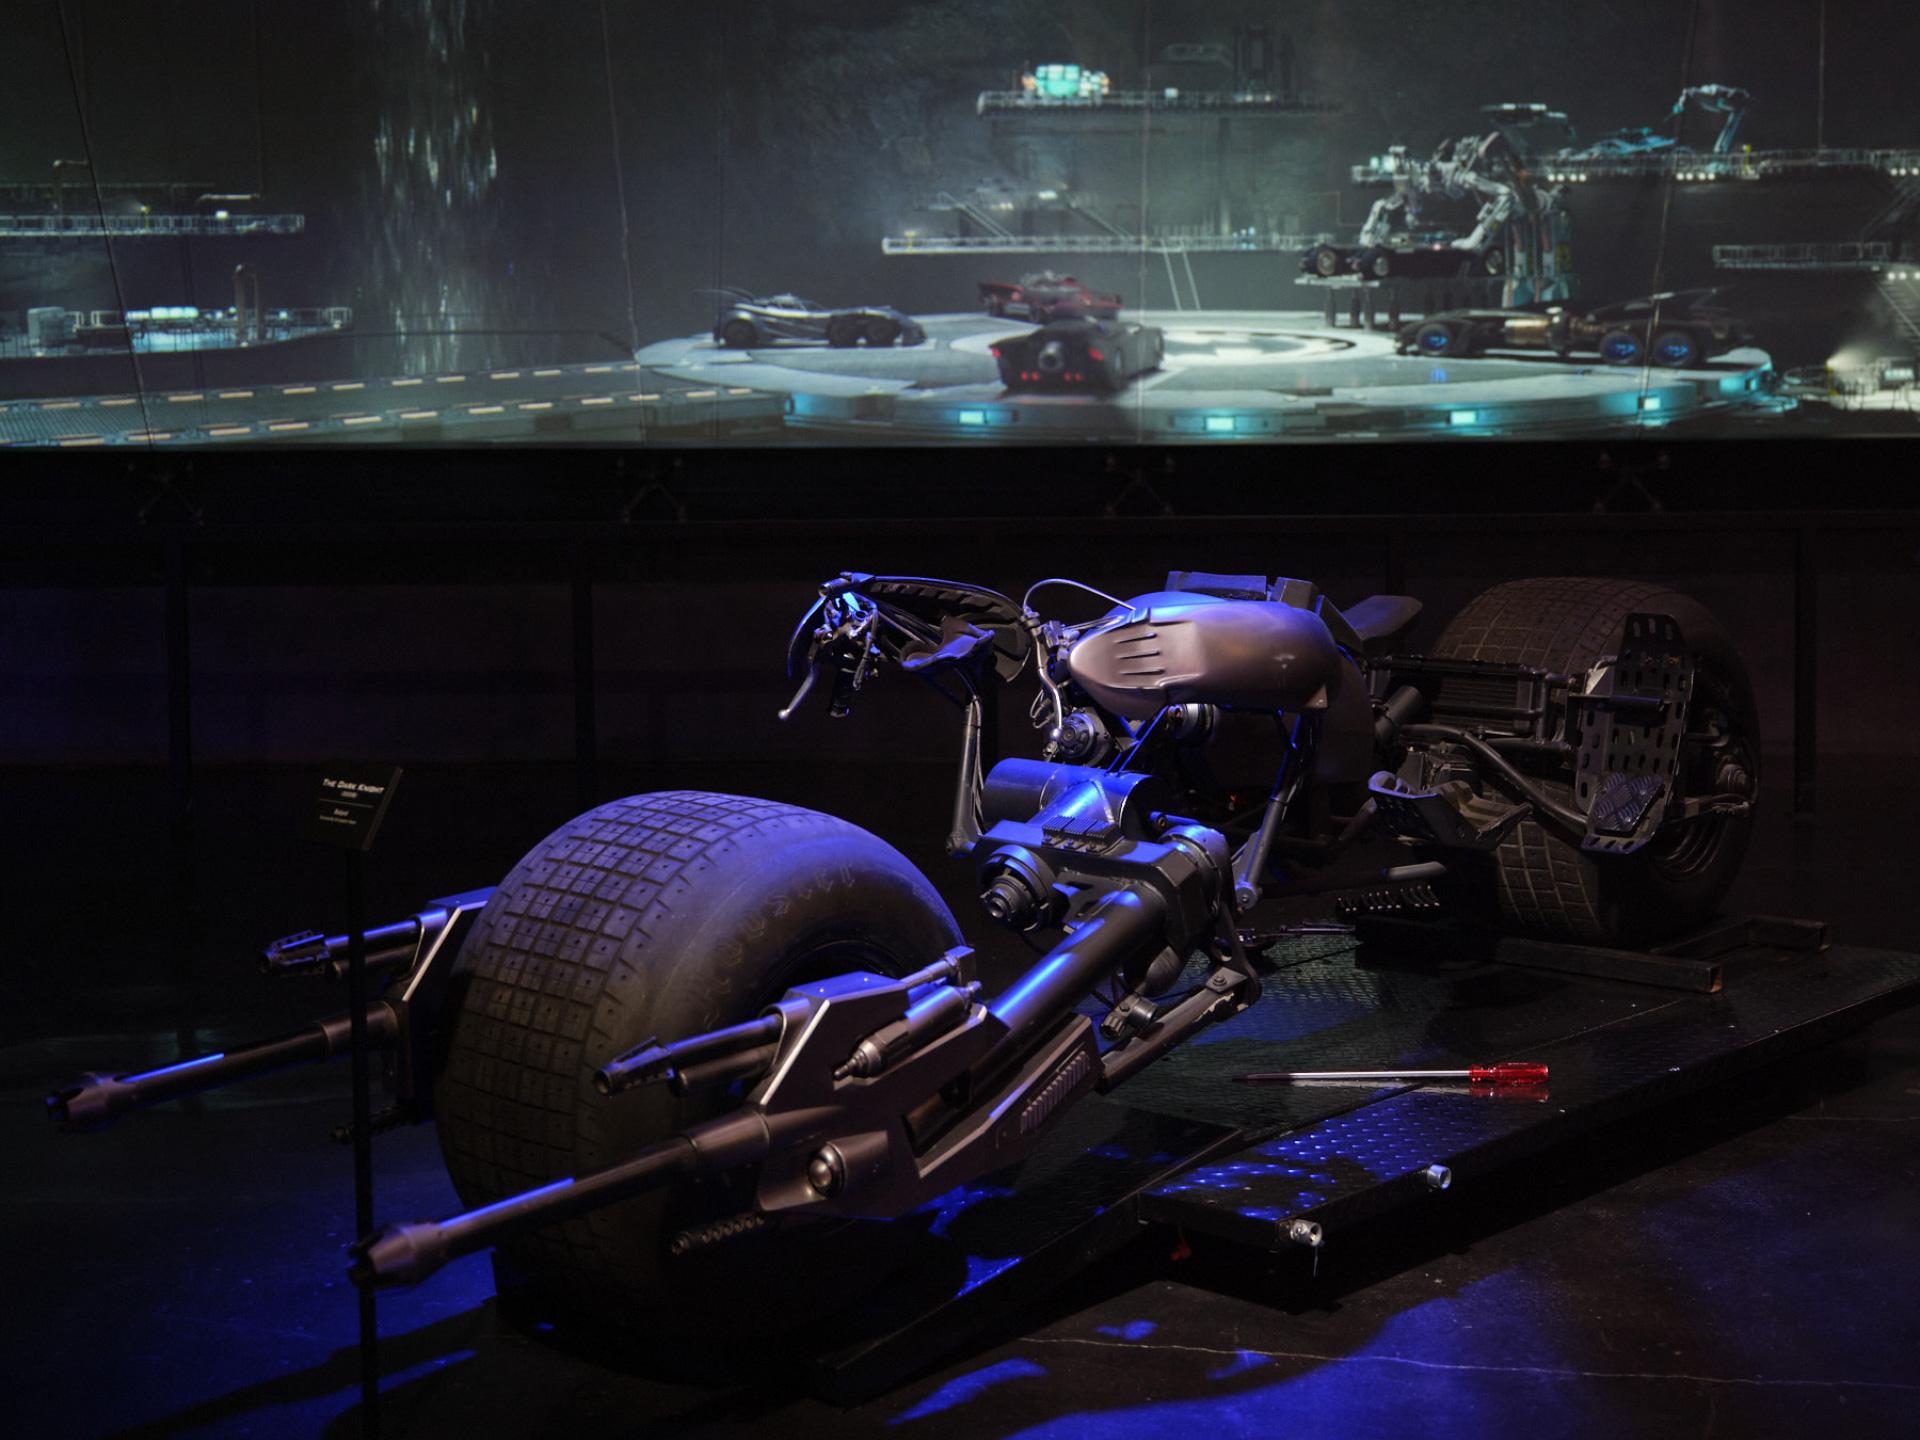 a-local-tour-through-entertainment-history-9-batman-motorcycle-the-dark-knight-2008